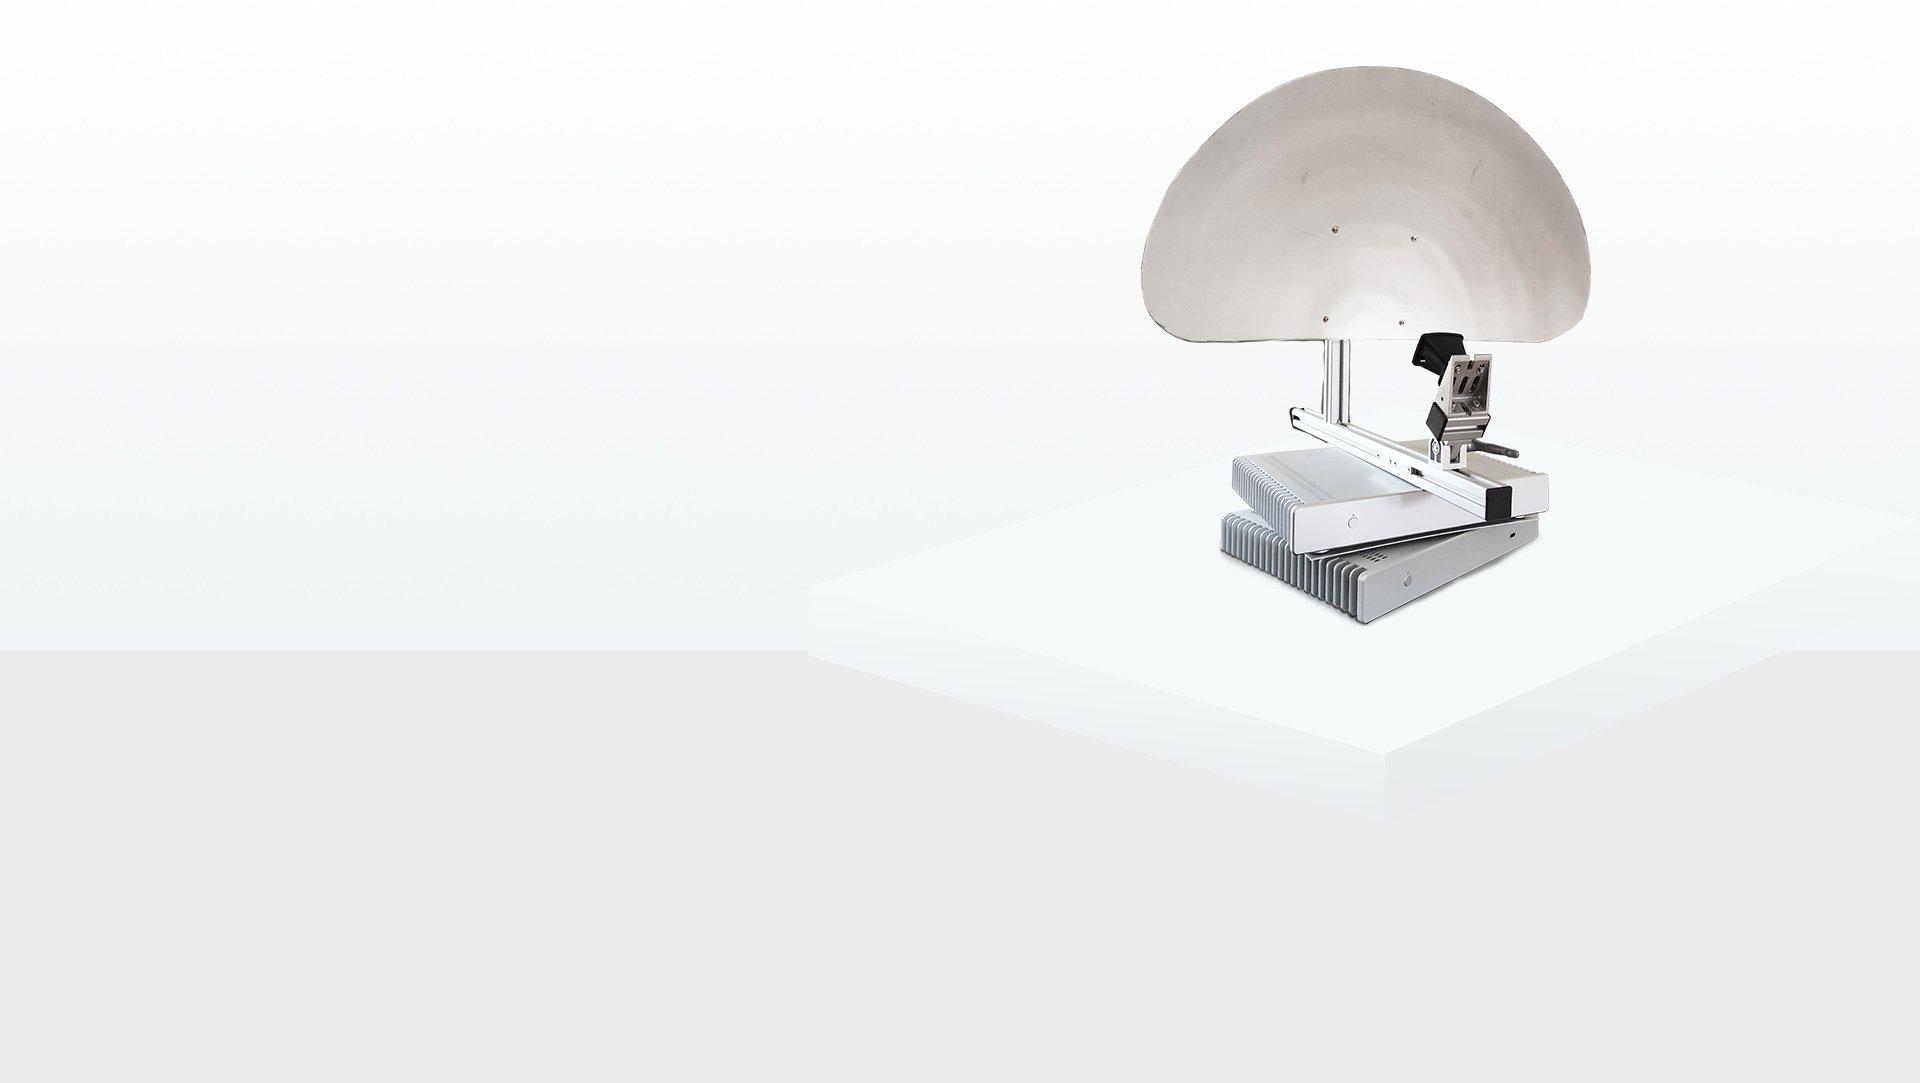 NextGen 8 GHz Pulse Radar